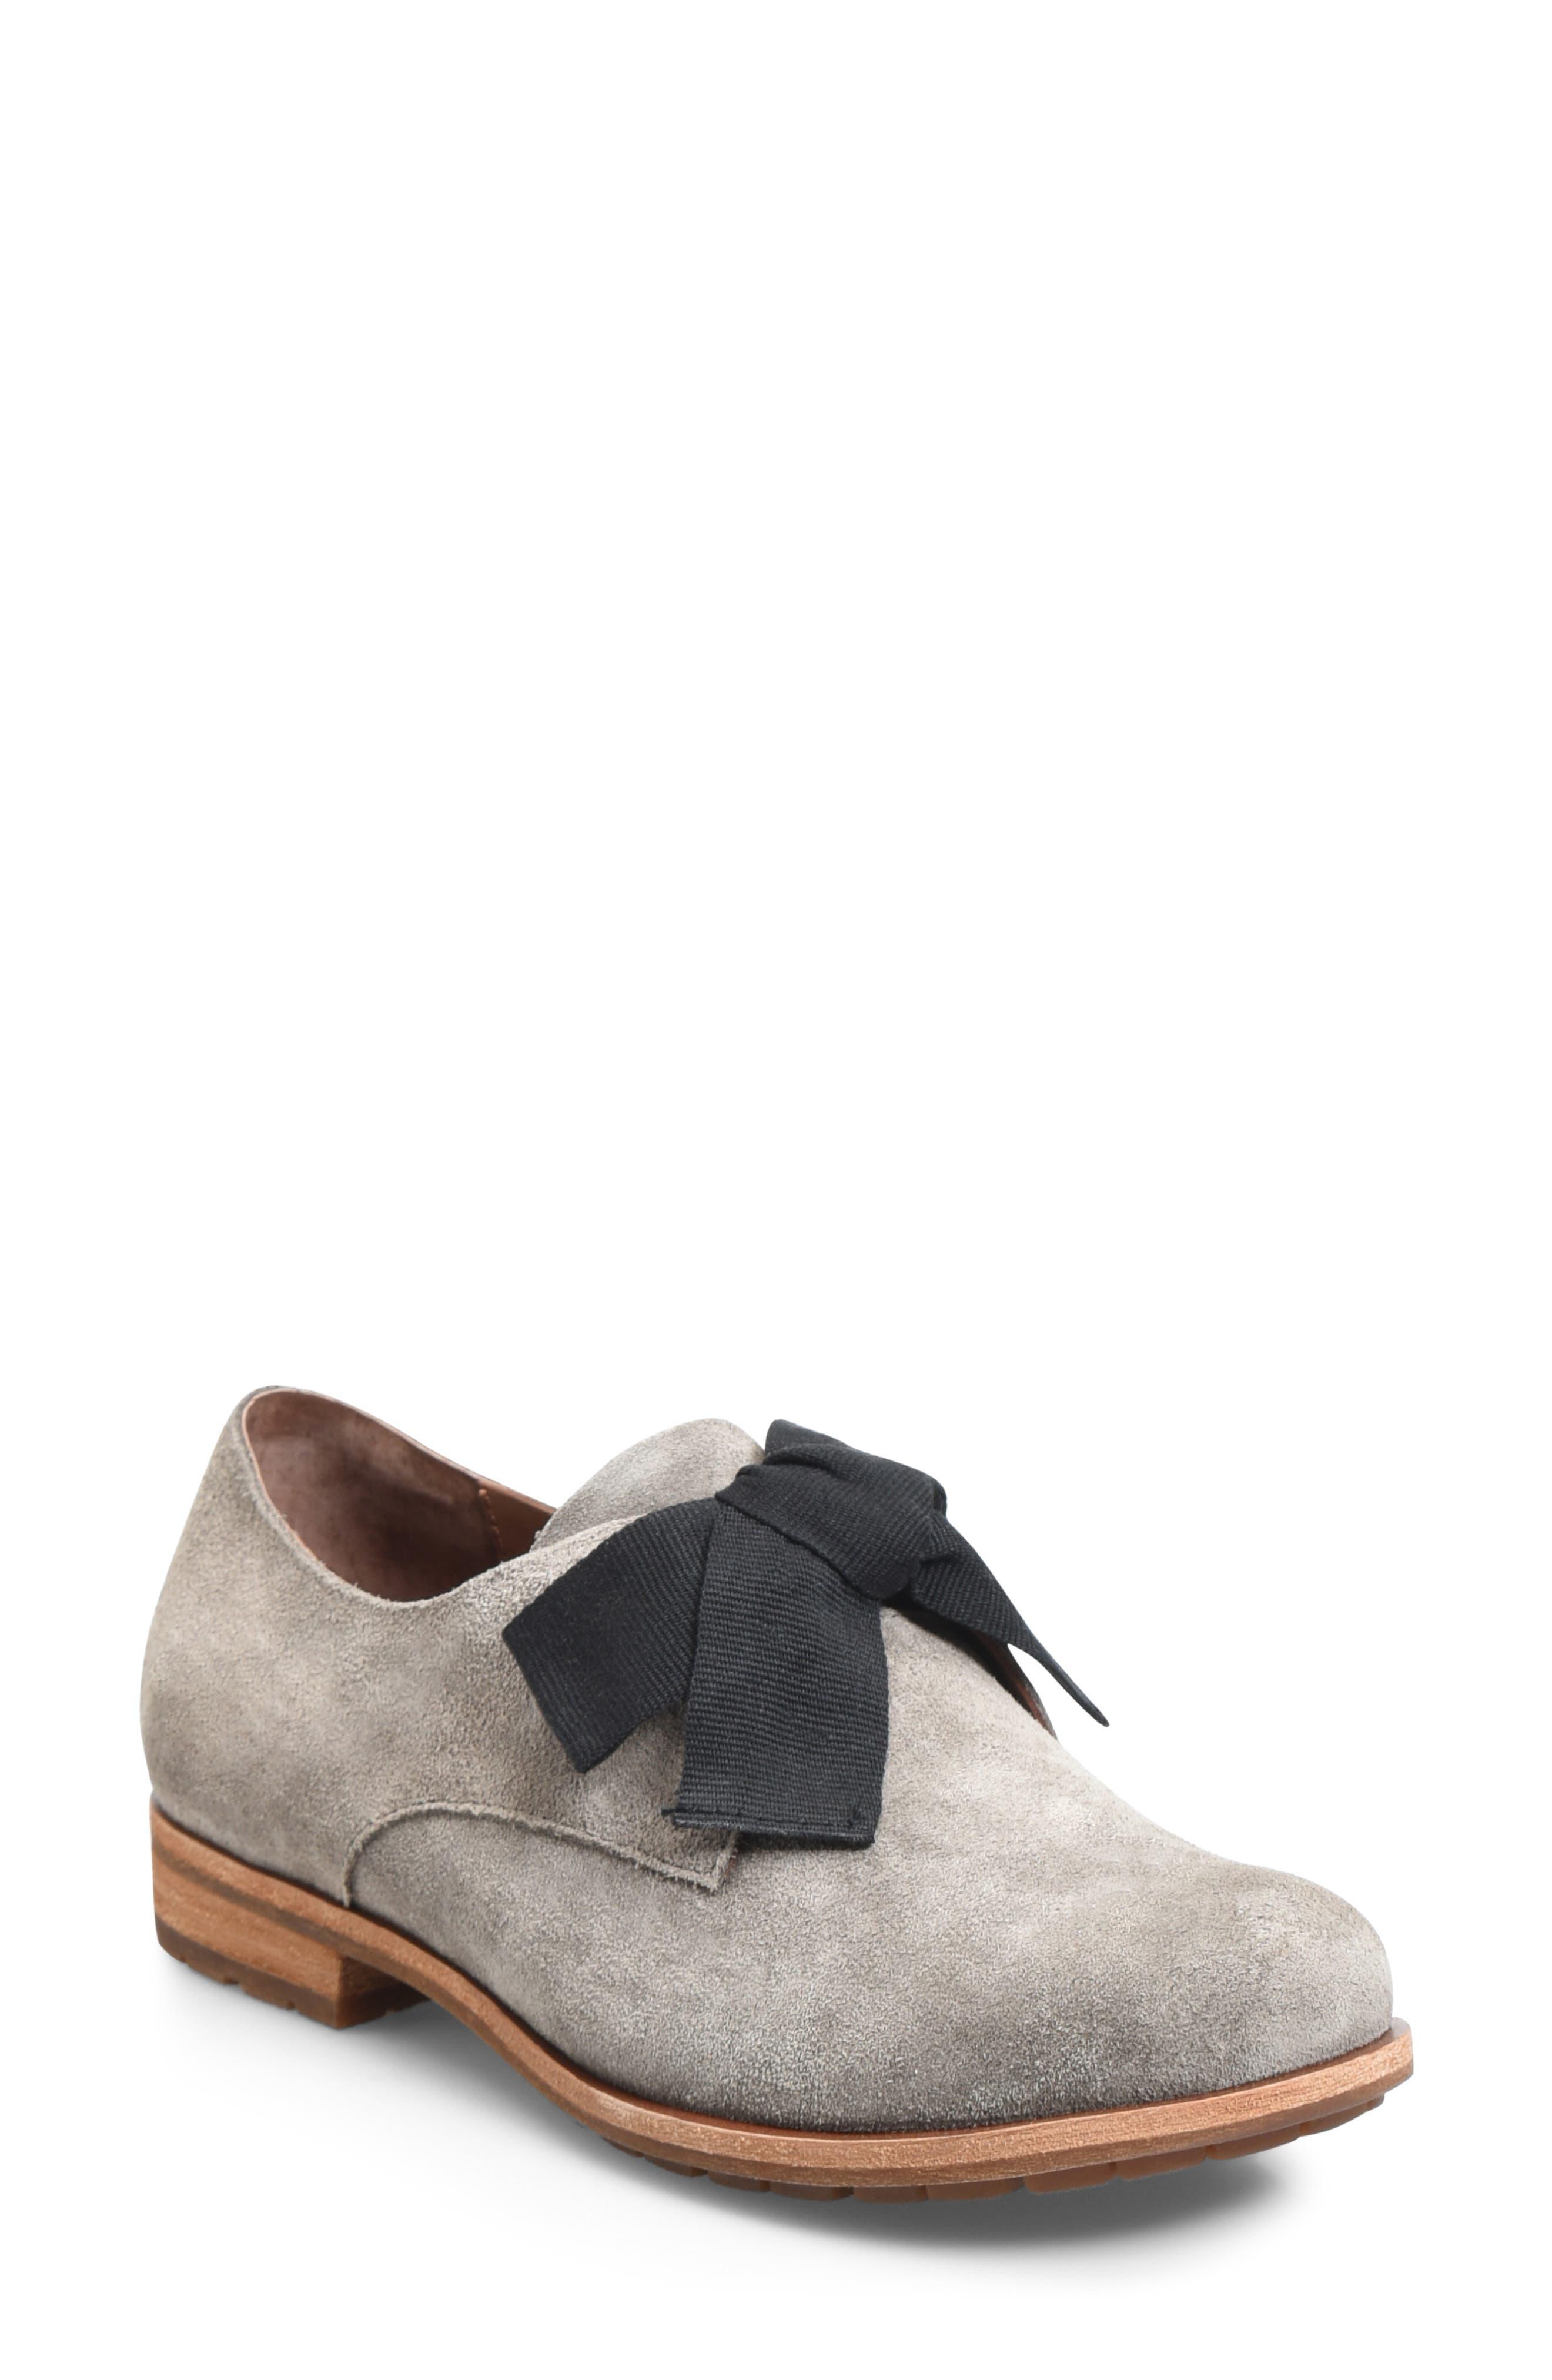 Kork-Ease Beryl Bow Flat- Grey